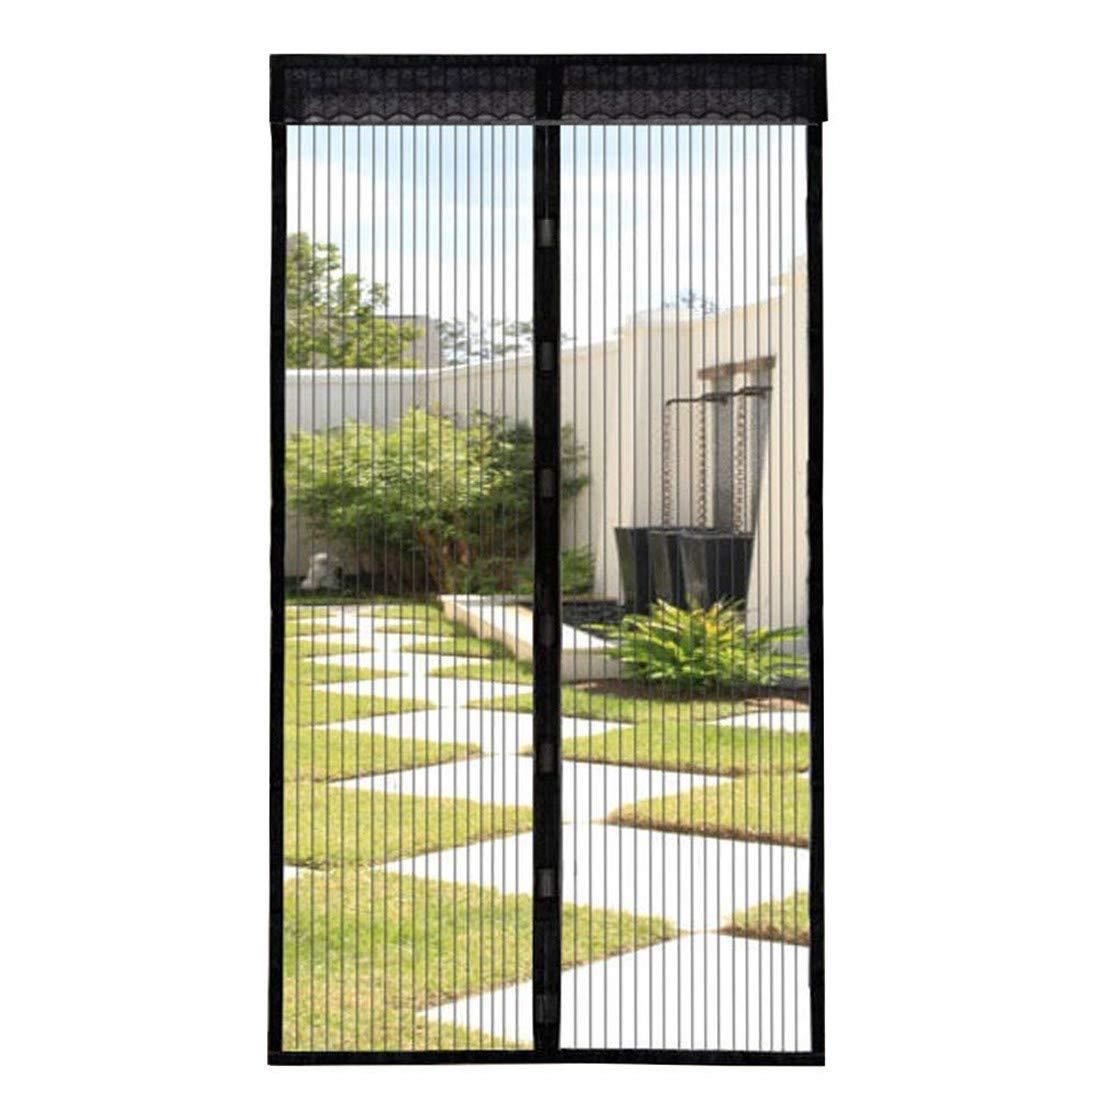 Fliegengitter Tür Magnet Insektenschutz Magnetischer Fliegenvorhang Moskitonetz Full-Frame-Klettverschluss Automatisch geschlossen Größe 90cm*210cm FuXing